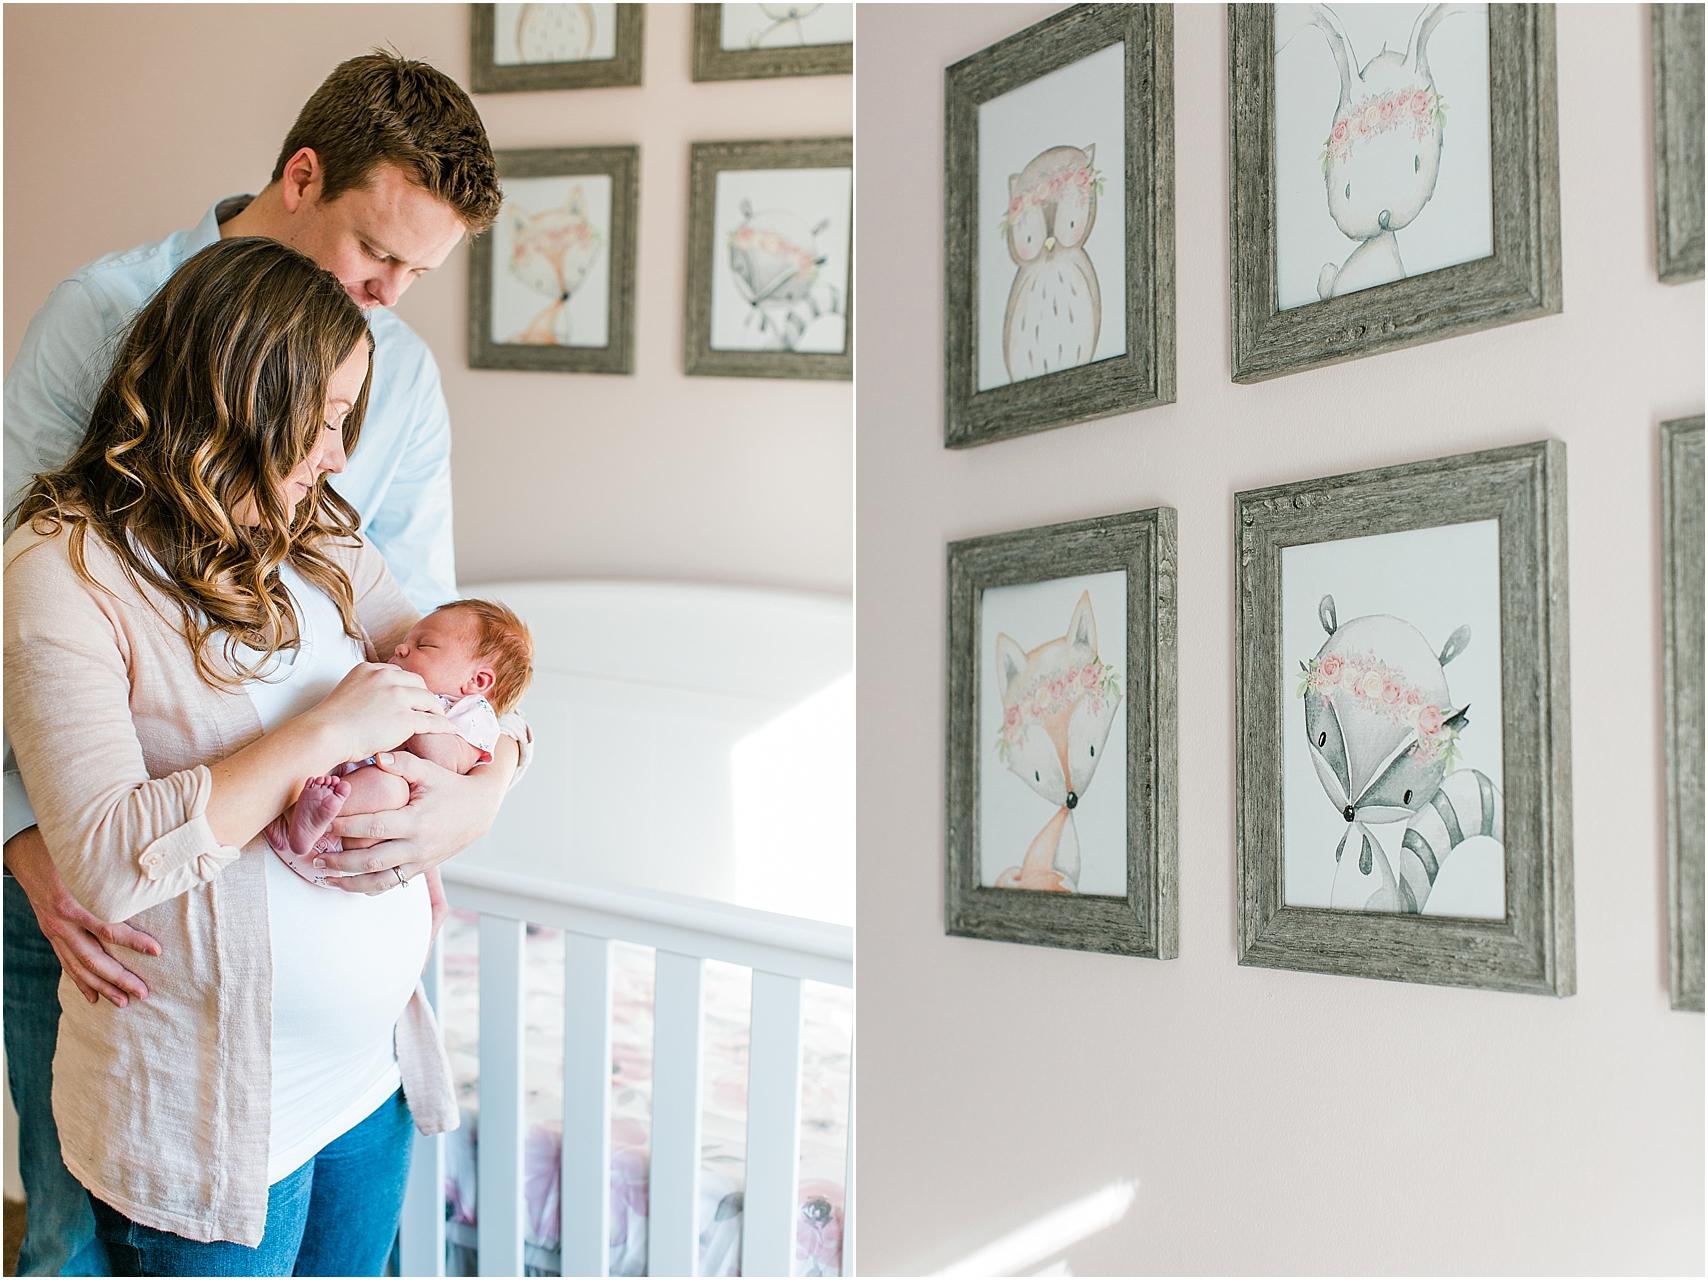 Minnesota Lifestyle In Home Newborn Photography Session Eagan Newborn Photography_0010.jpg